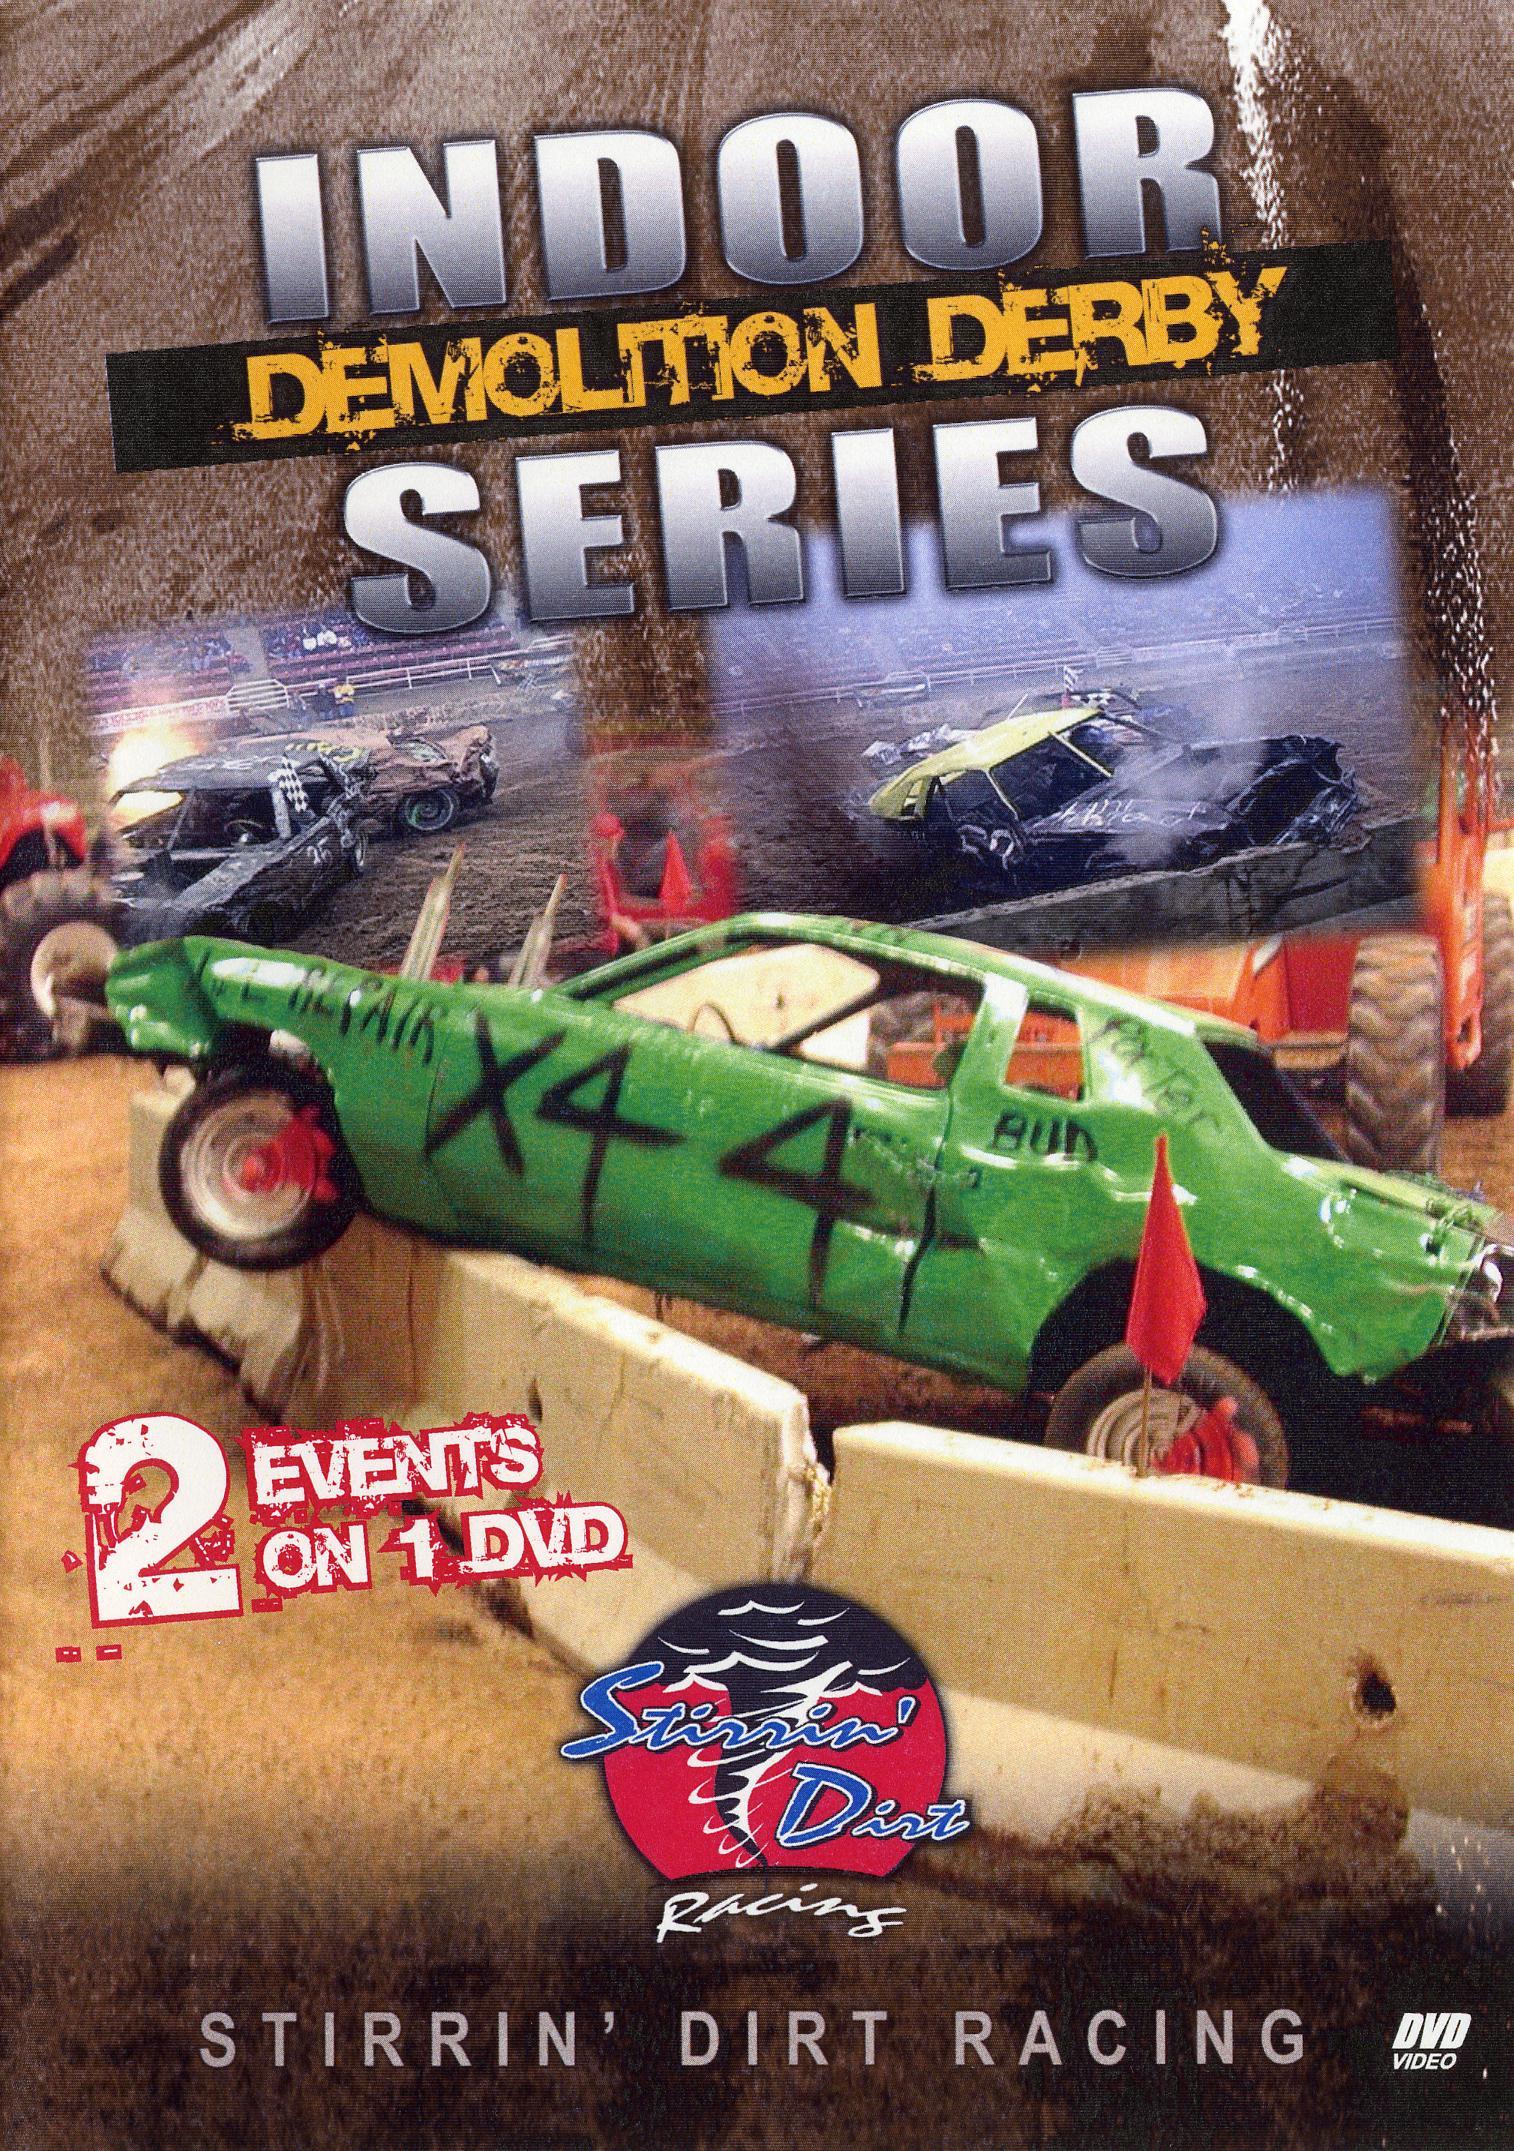 Indoor Demolition Derby Series